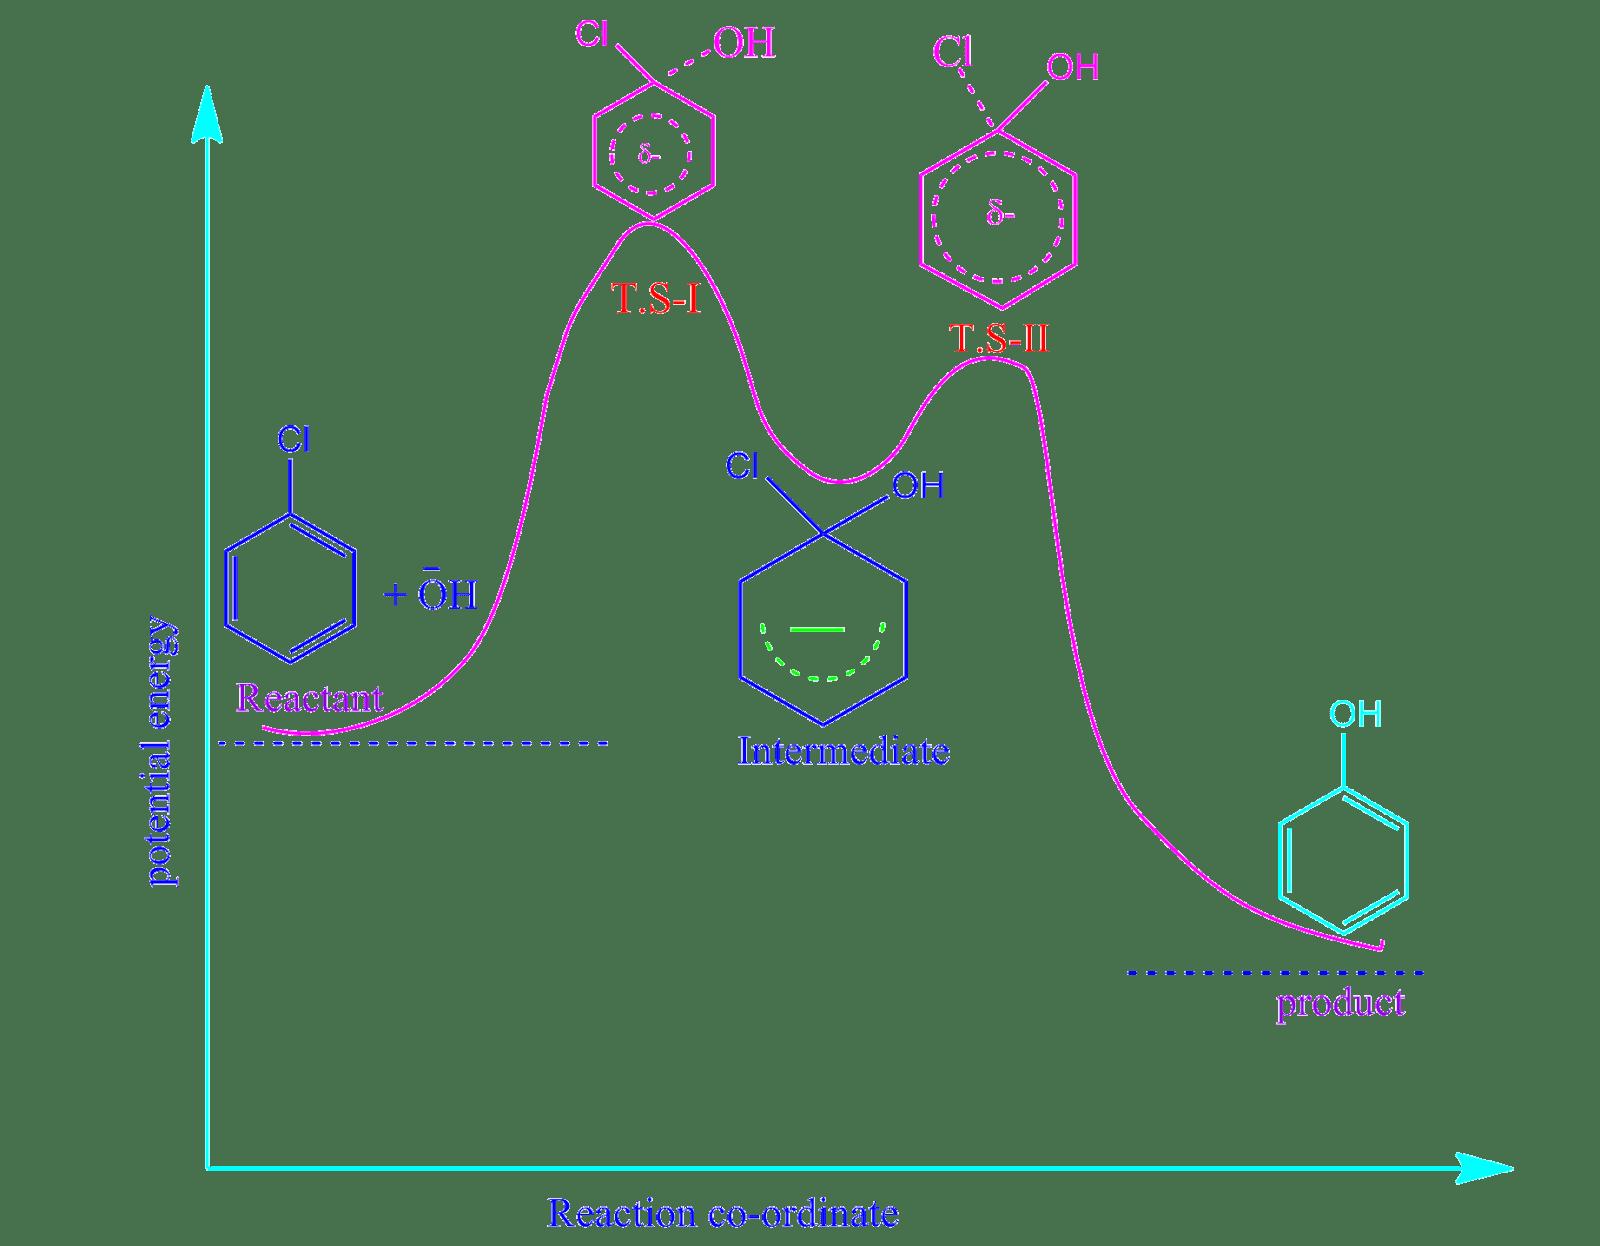 iii addition elimination reaction mechanism  [ 1600 x 1246 Pixel ]